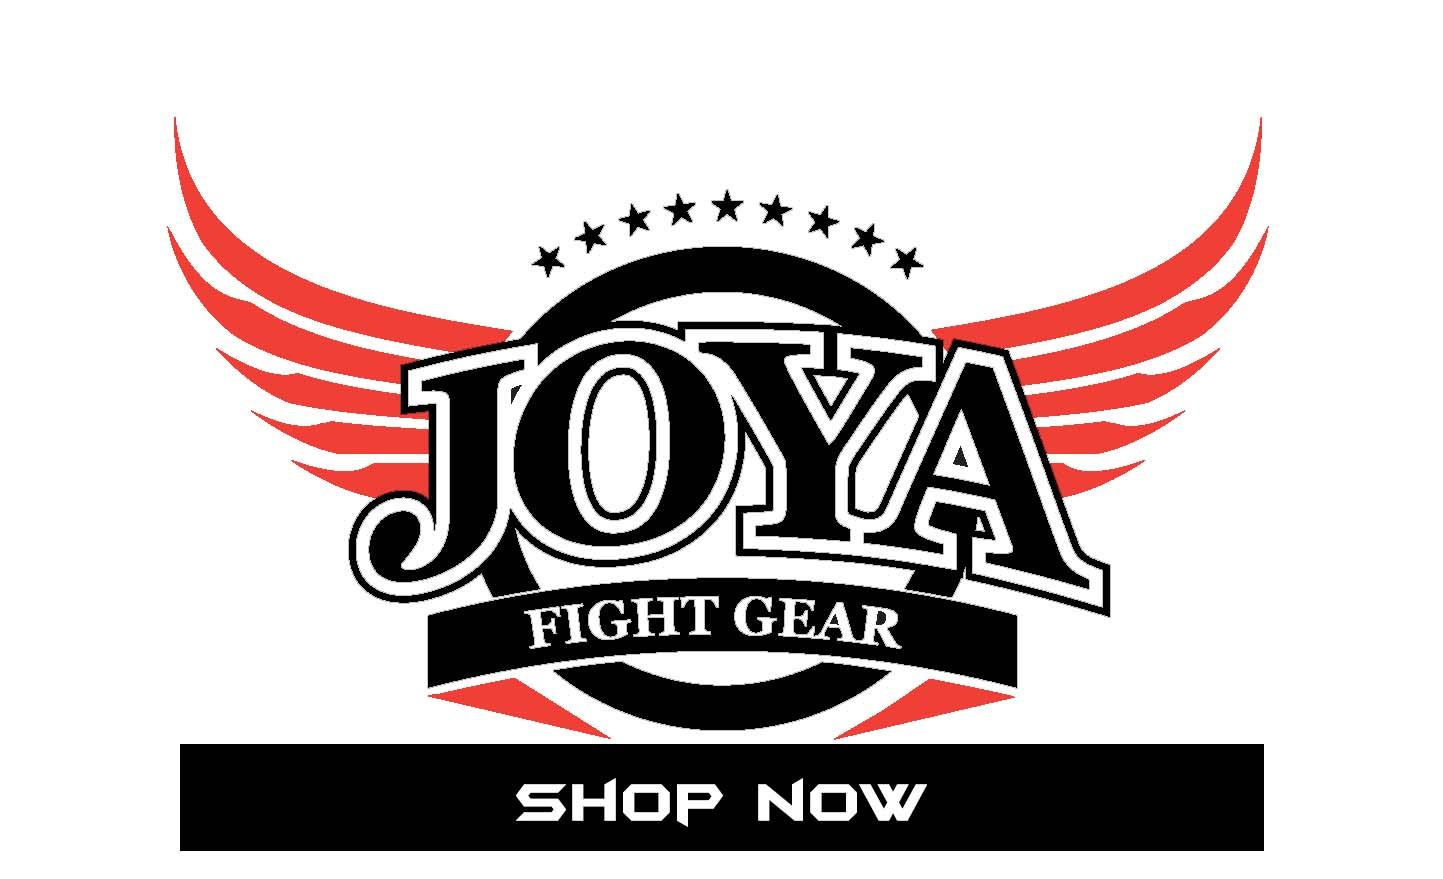 JOYA-ShopNow